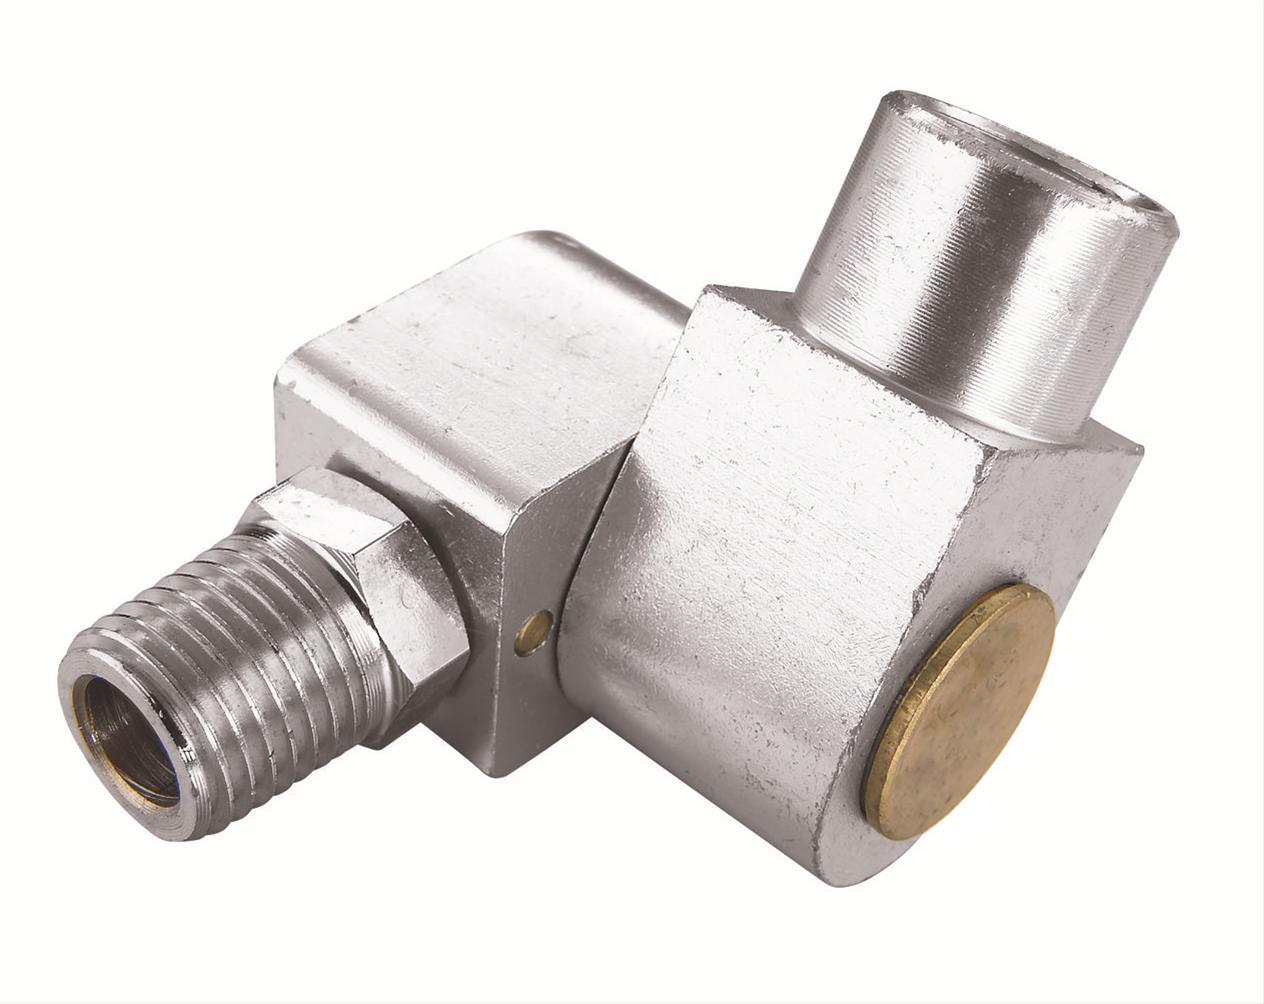 Craftsman air hose swivel connectors free